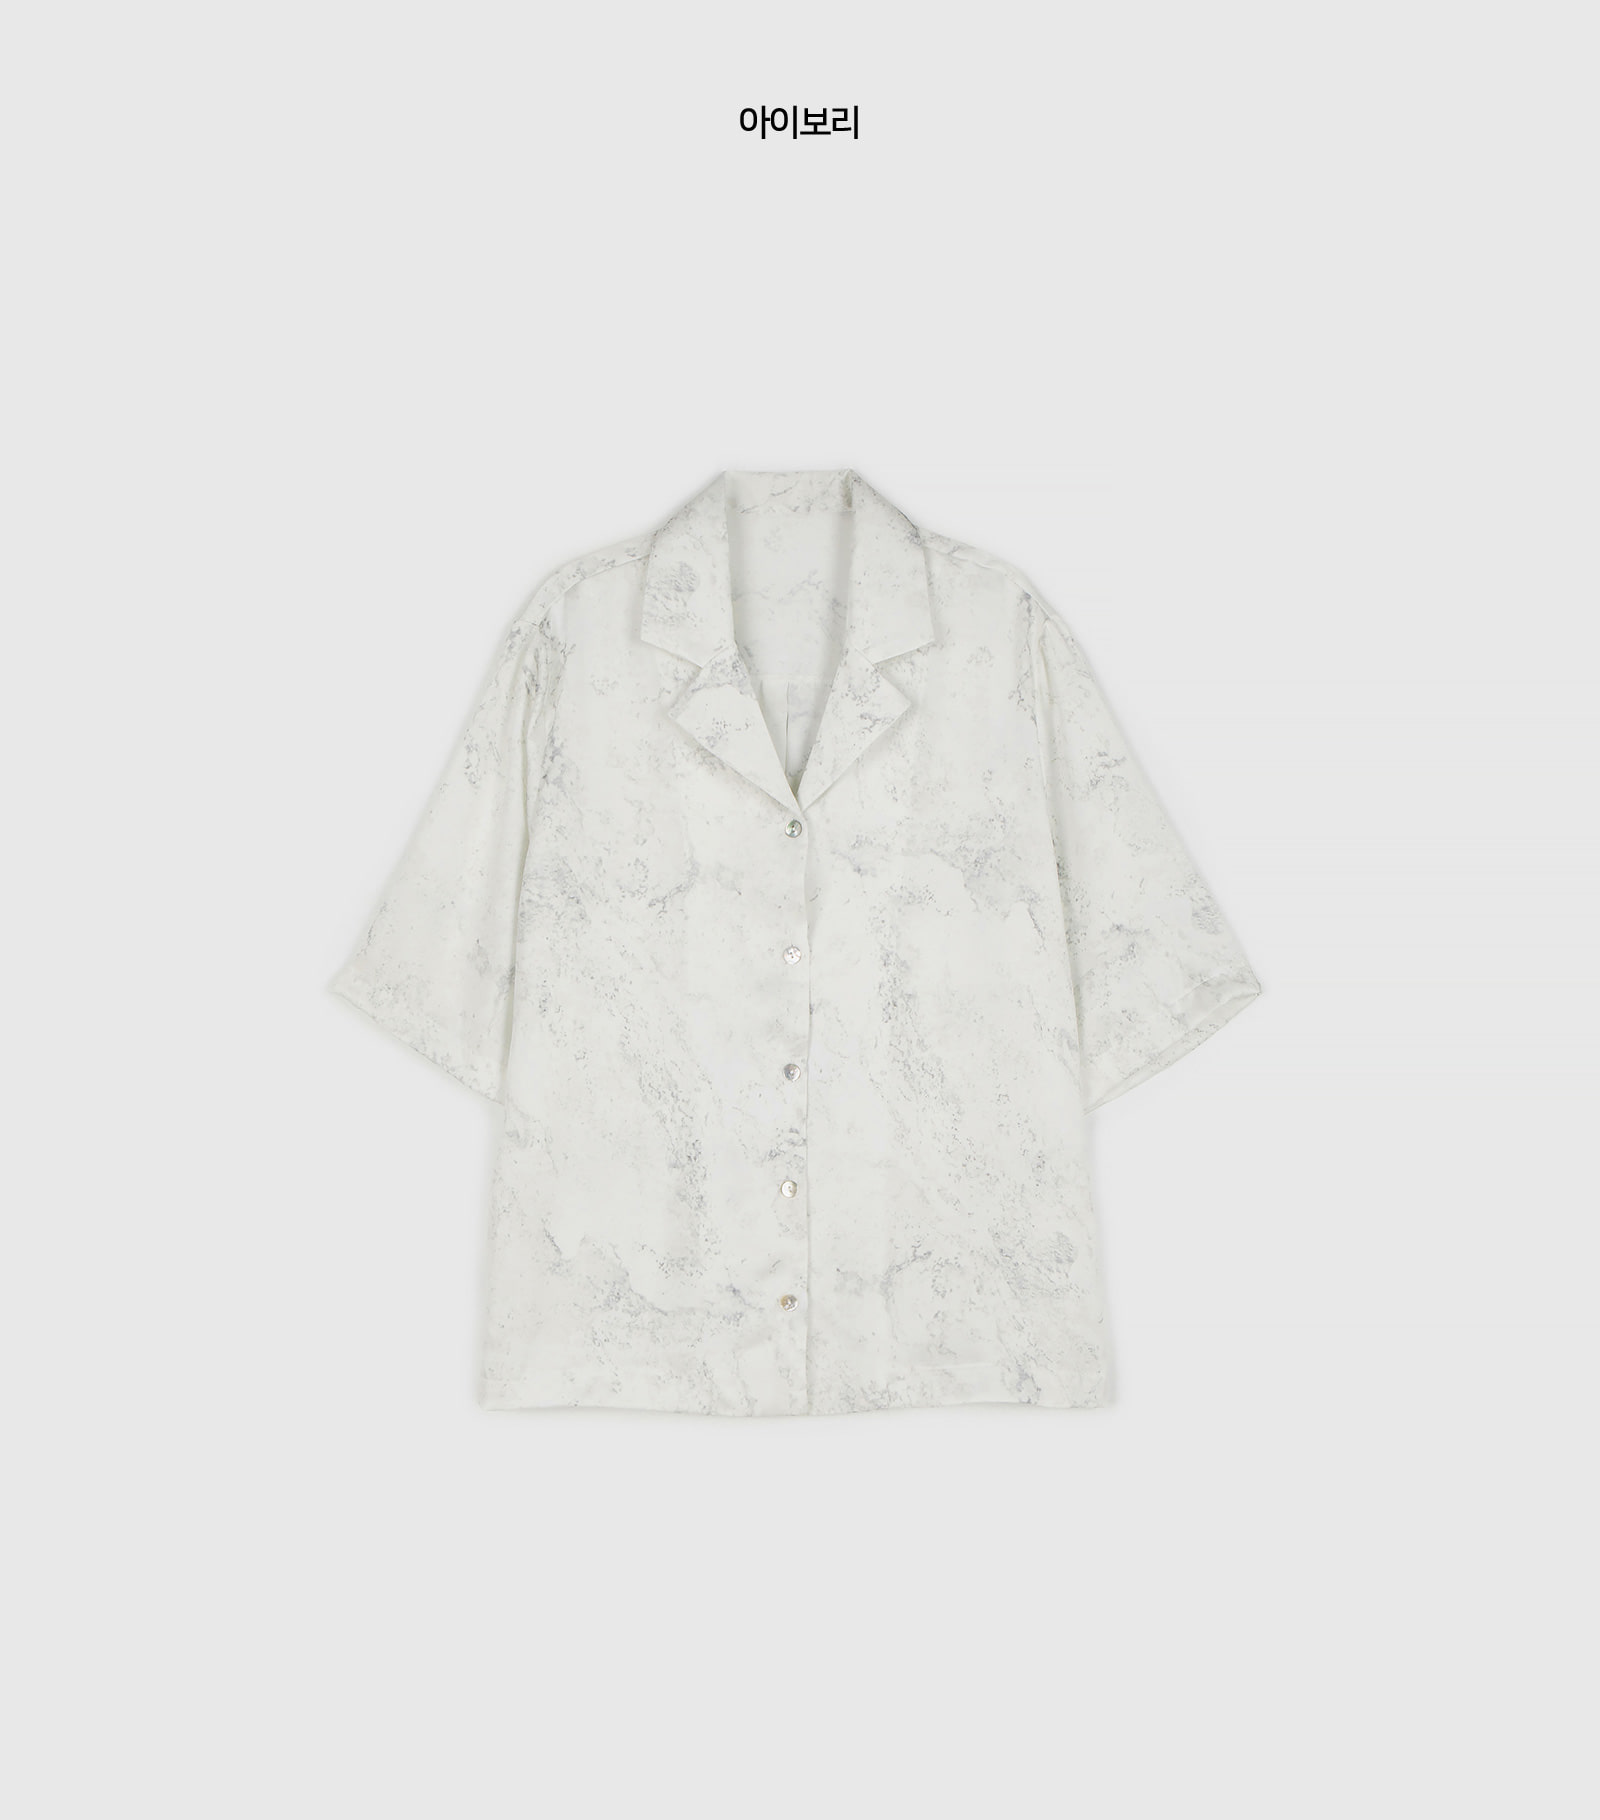 Soft marbling over shirt